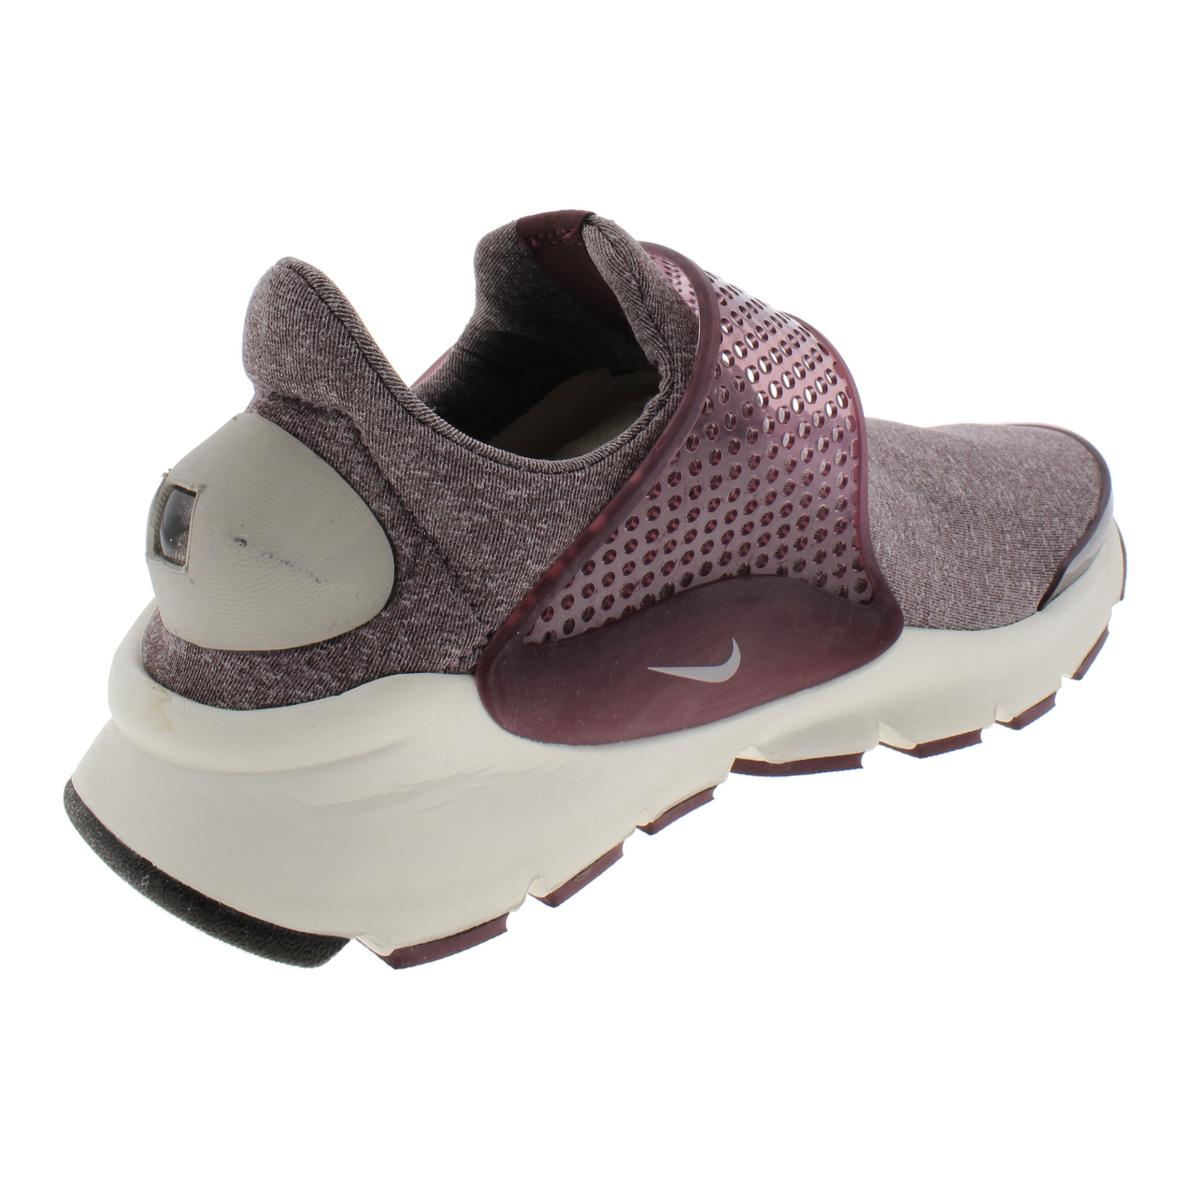 Nike-Womens-Sock-Dart-SE-Running-Low-Top-Athletic-Shoes-Sneakers-BHFO-3394 thumbnail 8